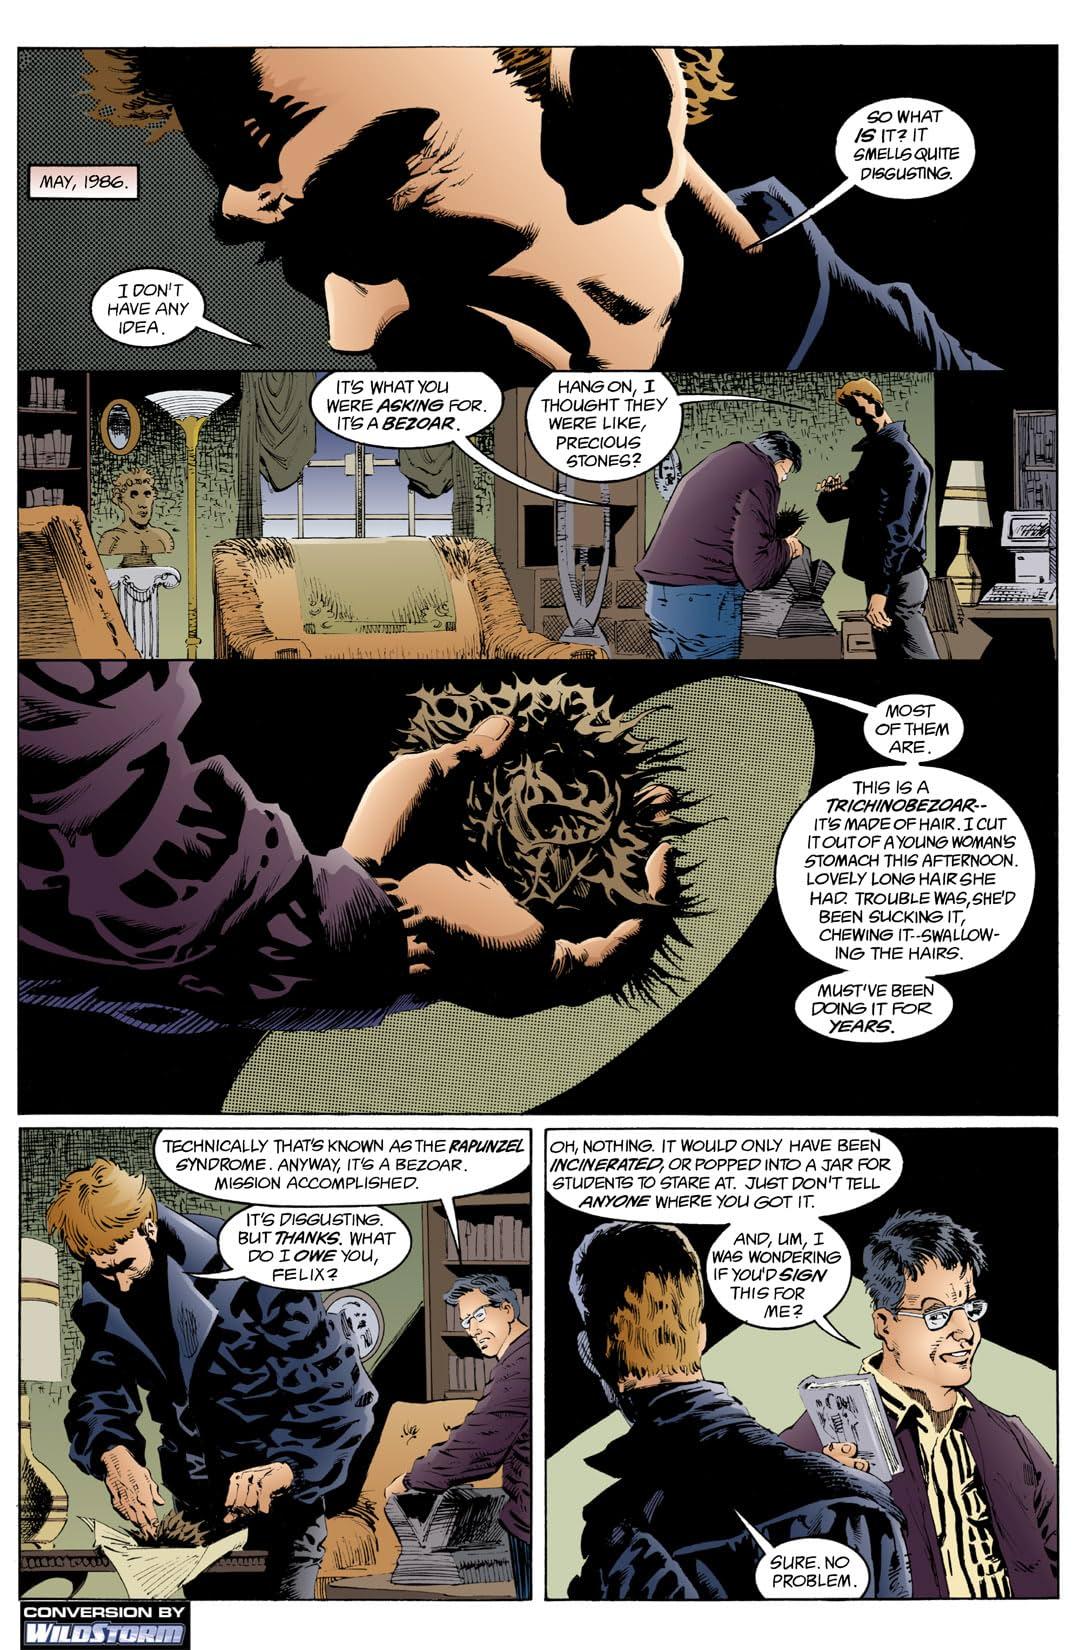 The Sandman #17